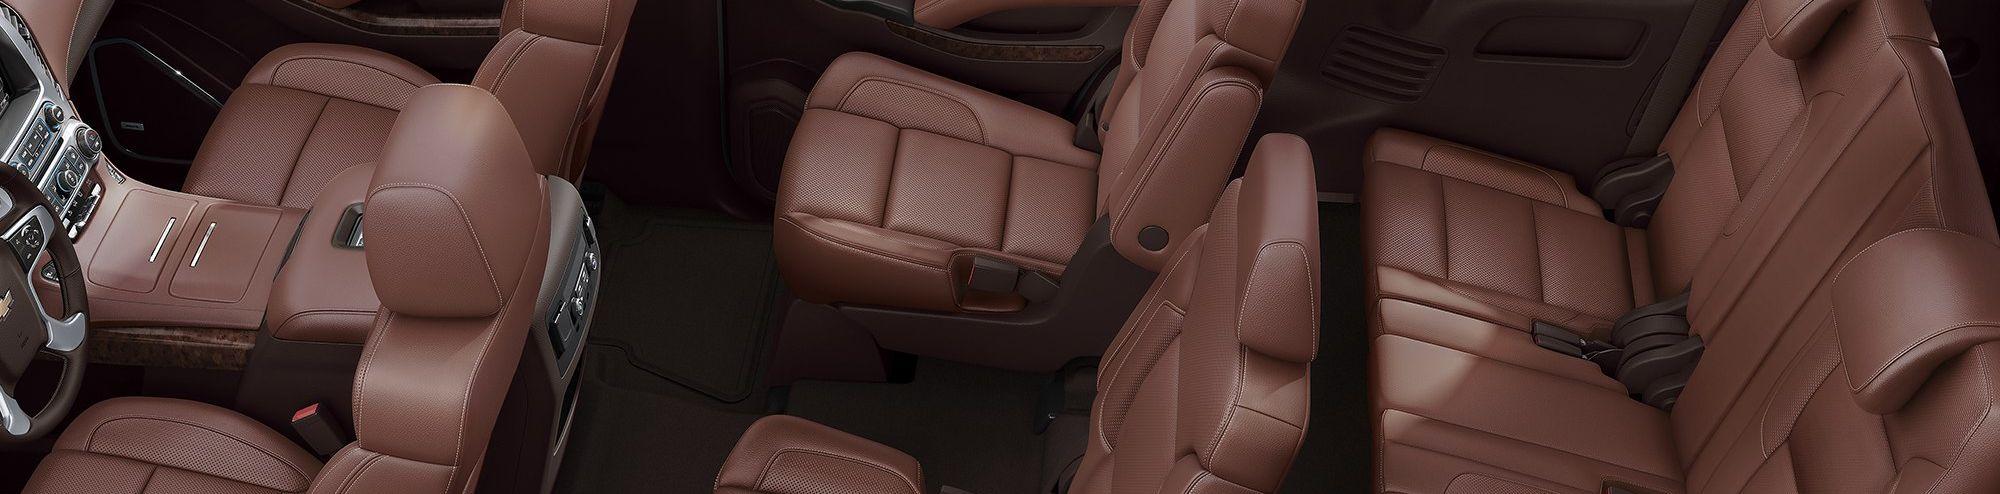 2019 Chevrolet Tahoe Full Seating